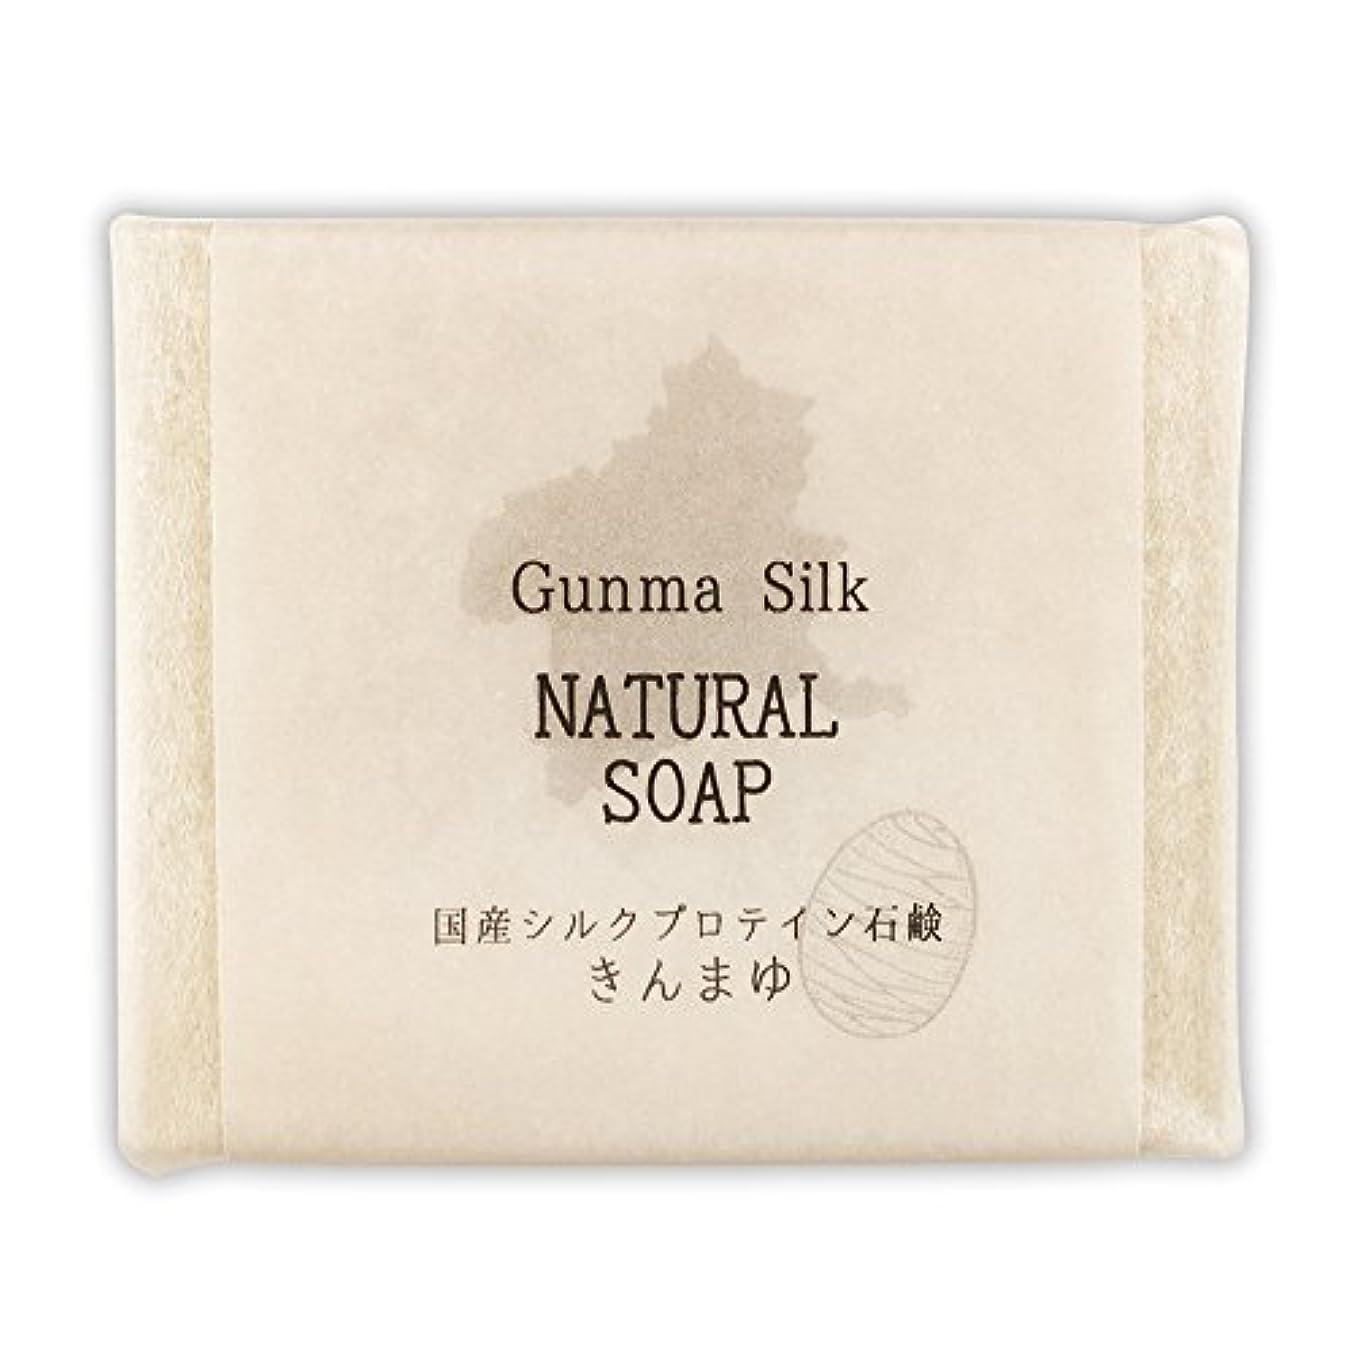 BN 国産シルクプロテイン石鹸 きんまゆ SKS-04 (1個)